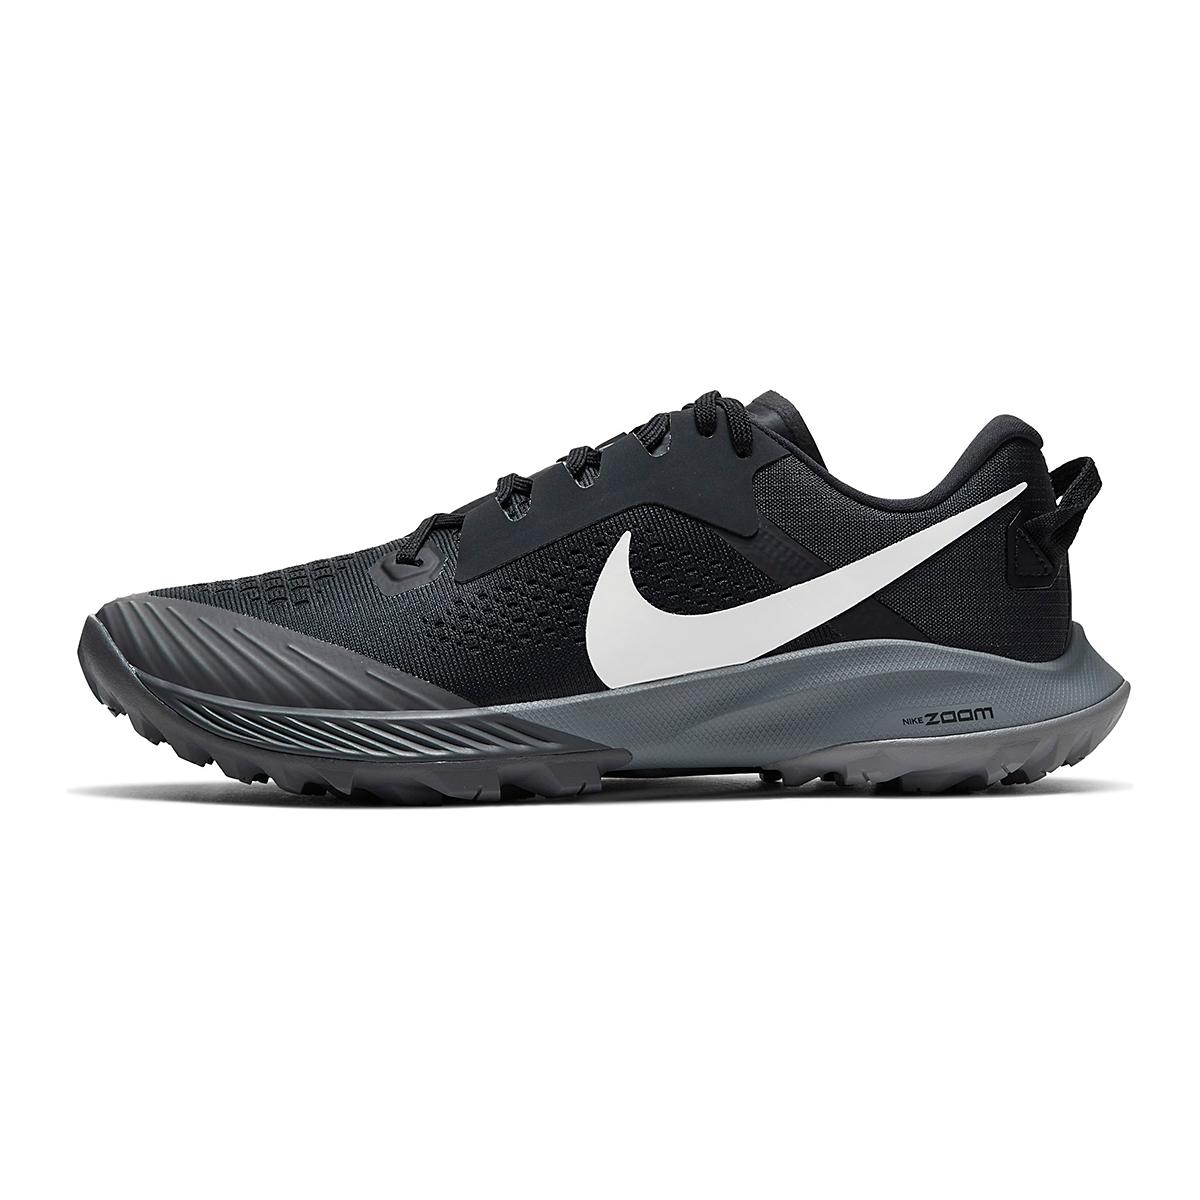 Women's Nike Air Zoom Terra Kiger 6 Trail Running Shoe - Color: Off Noir/Black/Iron Grey/Spruce Aura - Size: 5 - Width: Regular, Off Noir/Black/Iron Grey/Spruce Aura, large, image 3